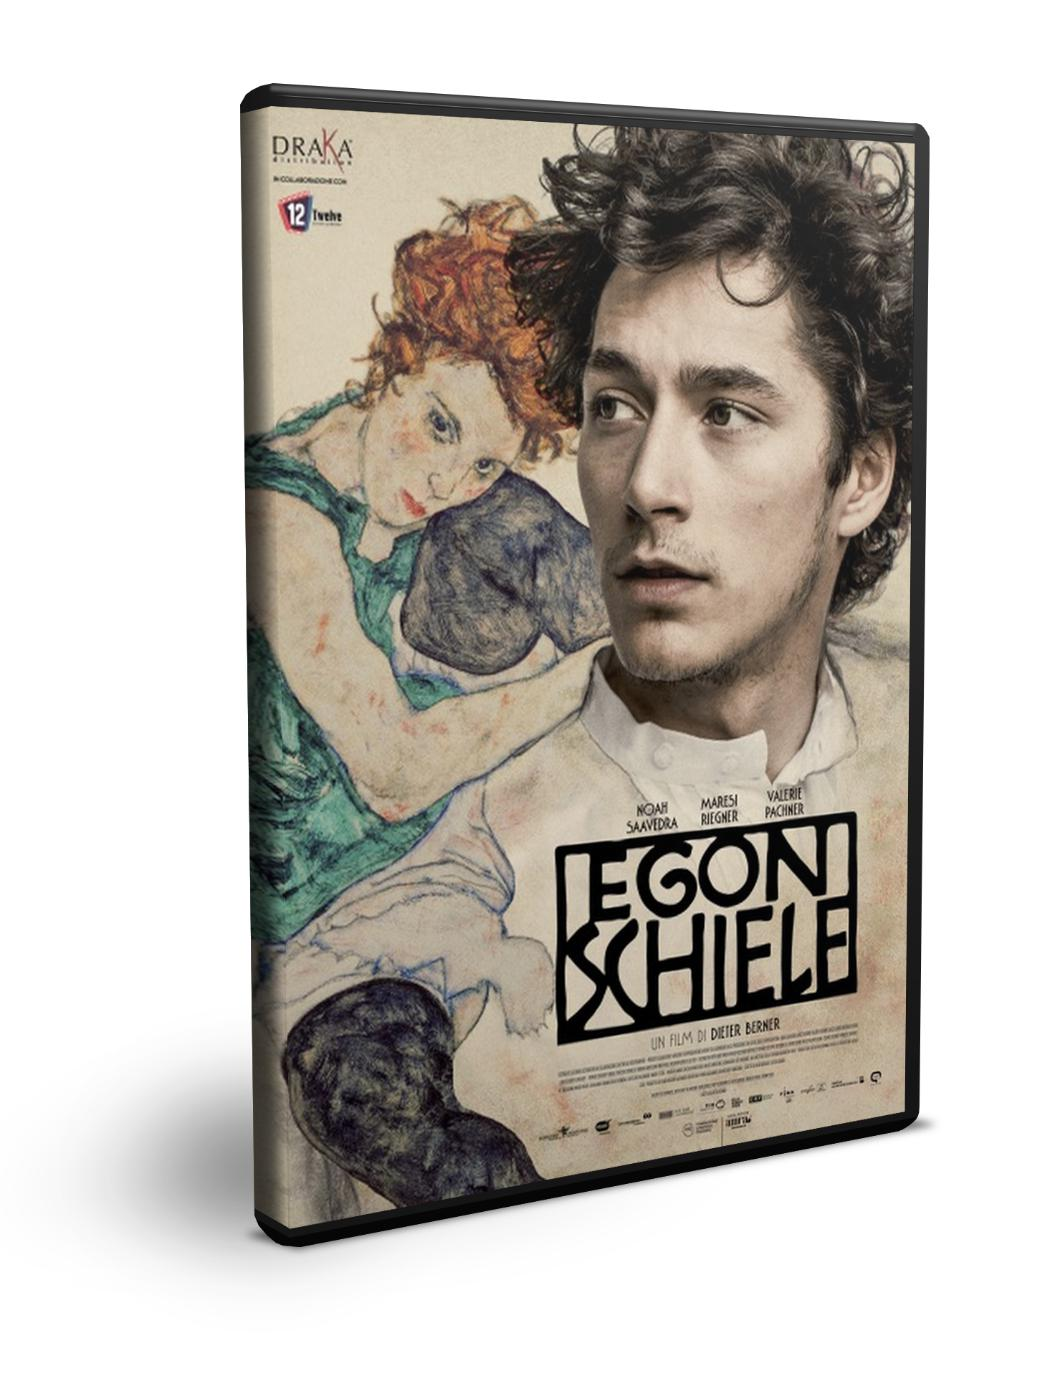 EGON SCHIELE (DVD)